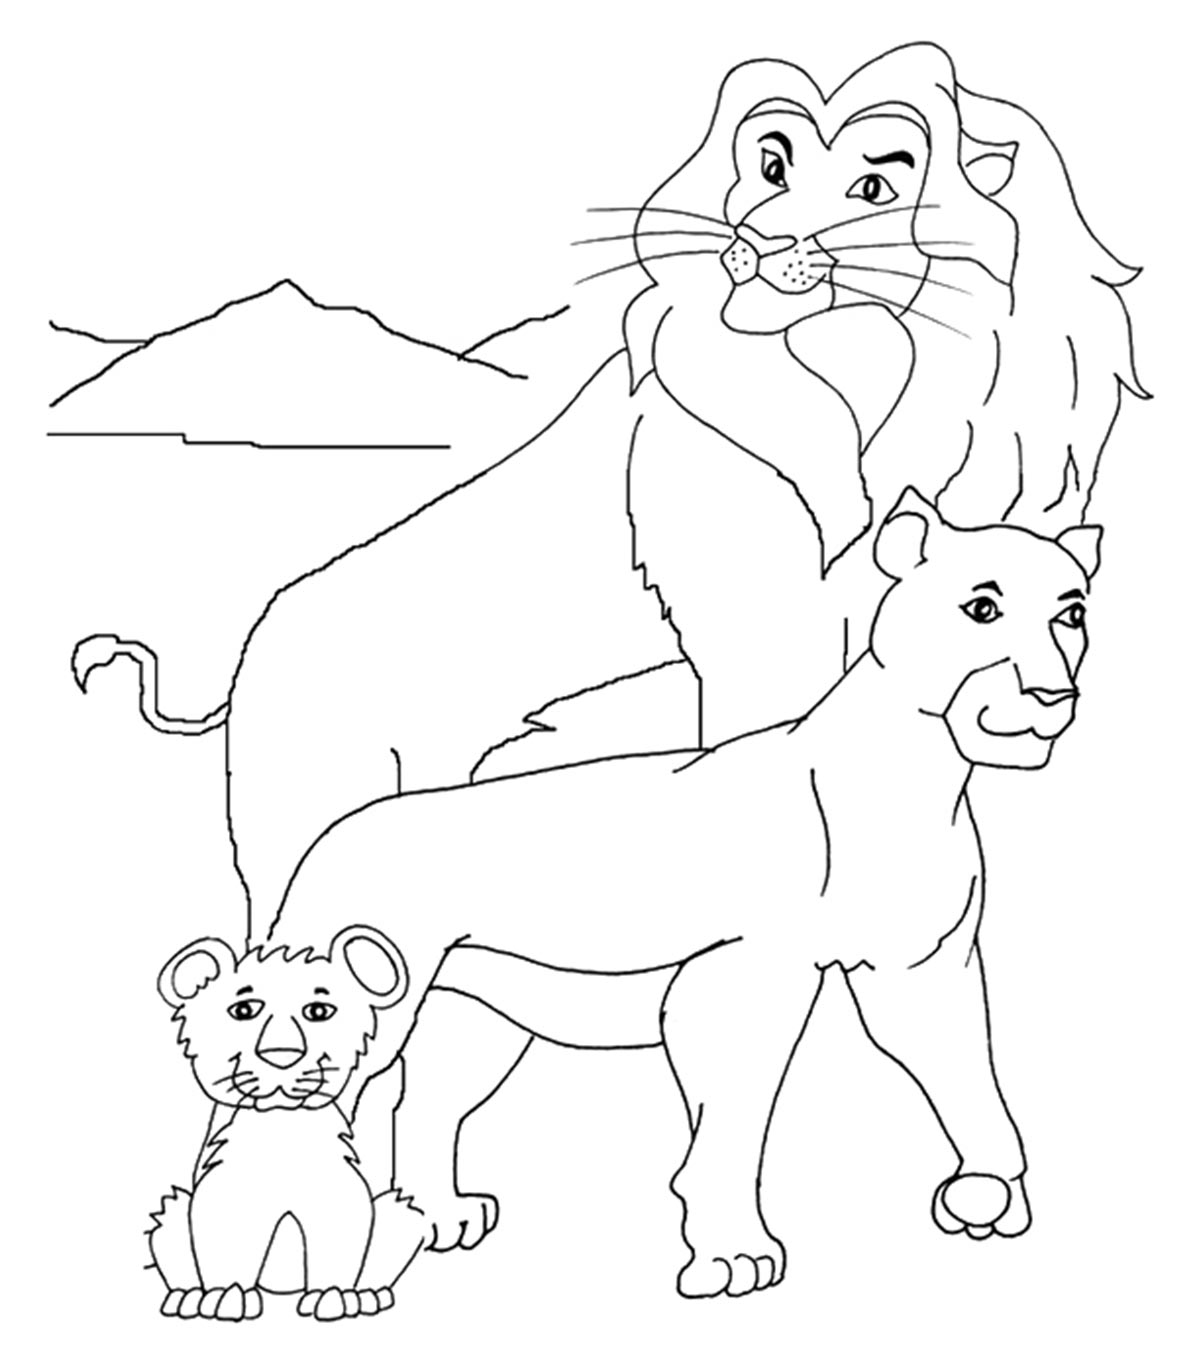 Samson Carries Gates of Gaza coloring page   Free Printable ...   1350x1200